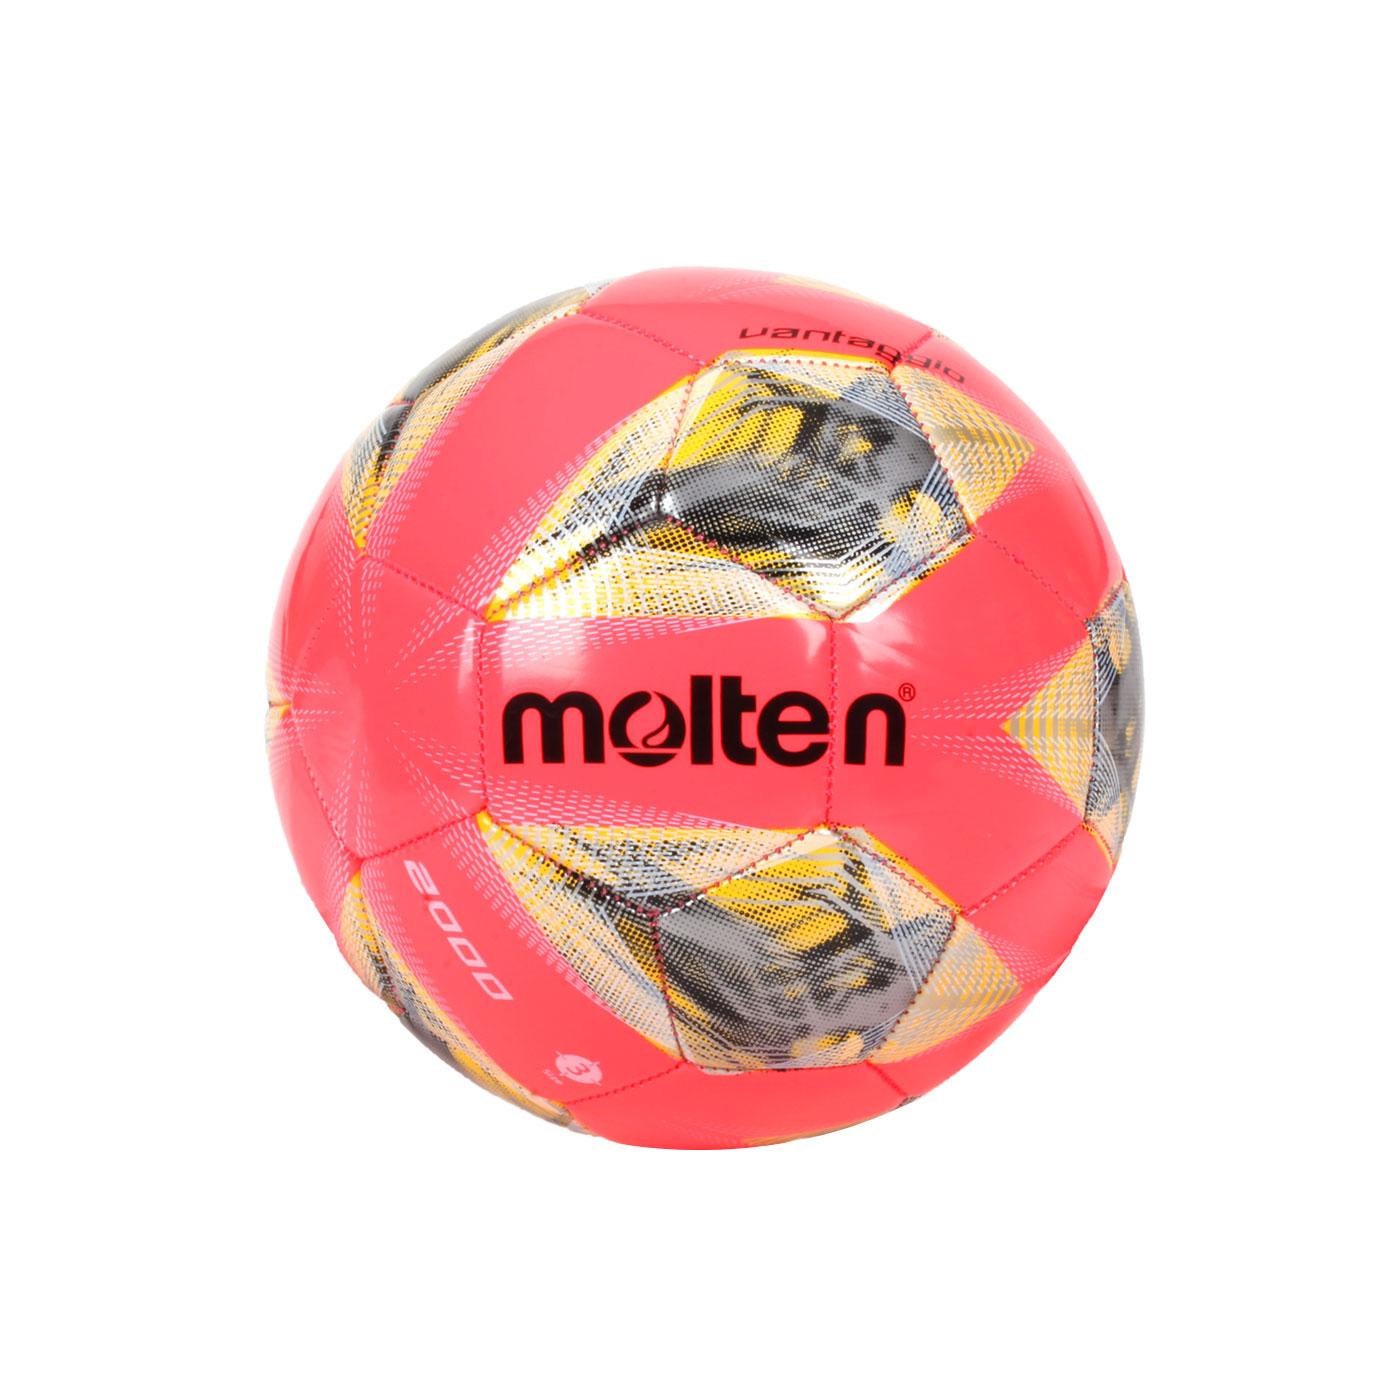 Molten #3合成皮足球 F3A2000-RY